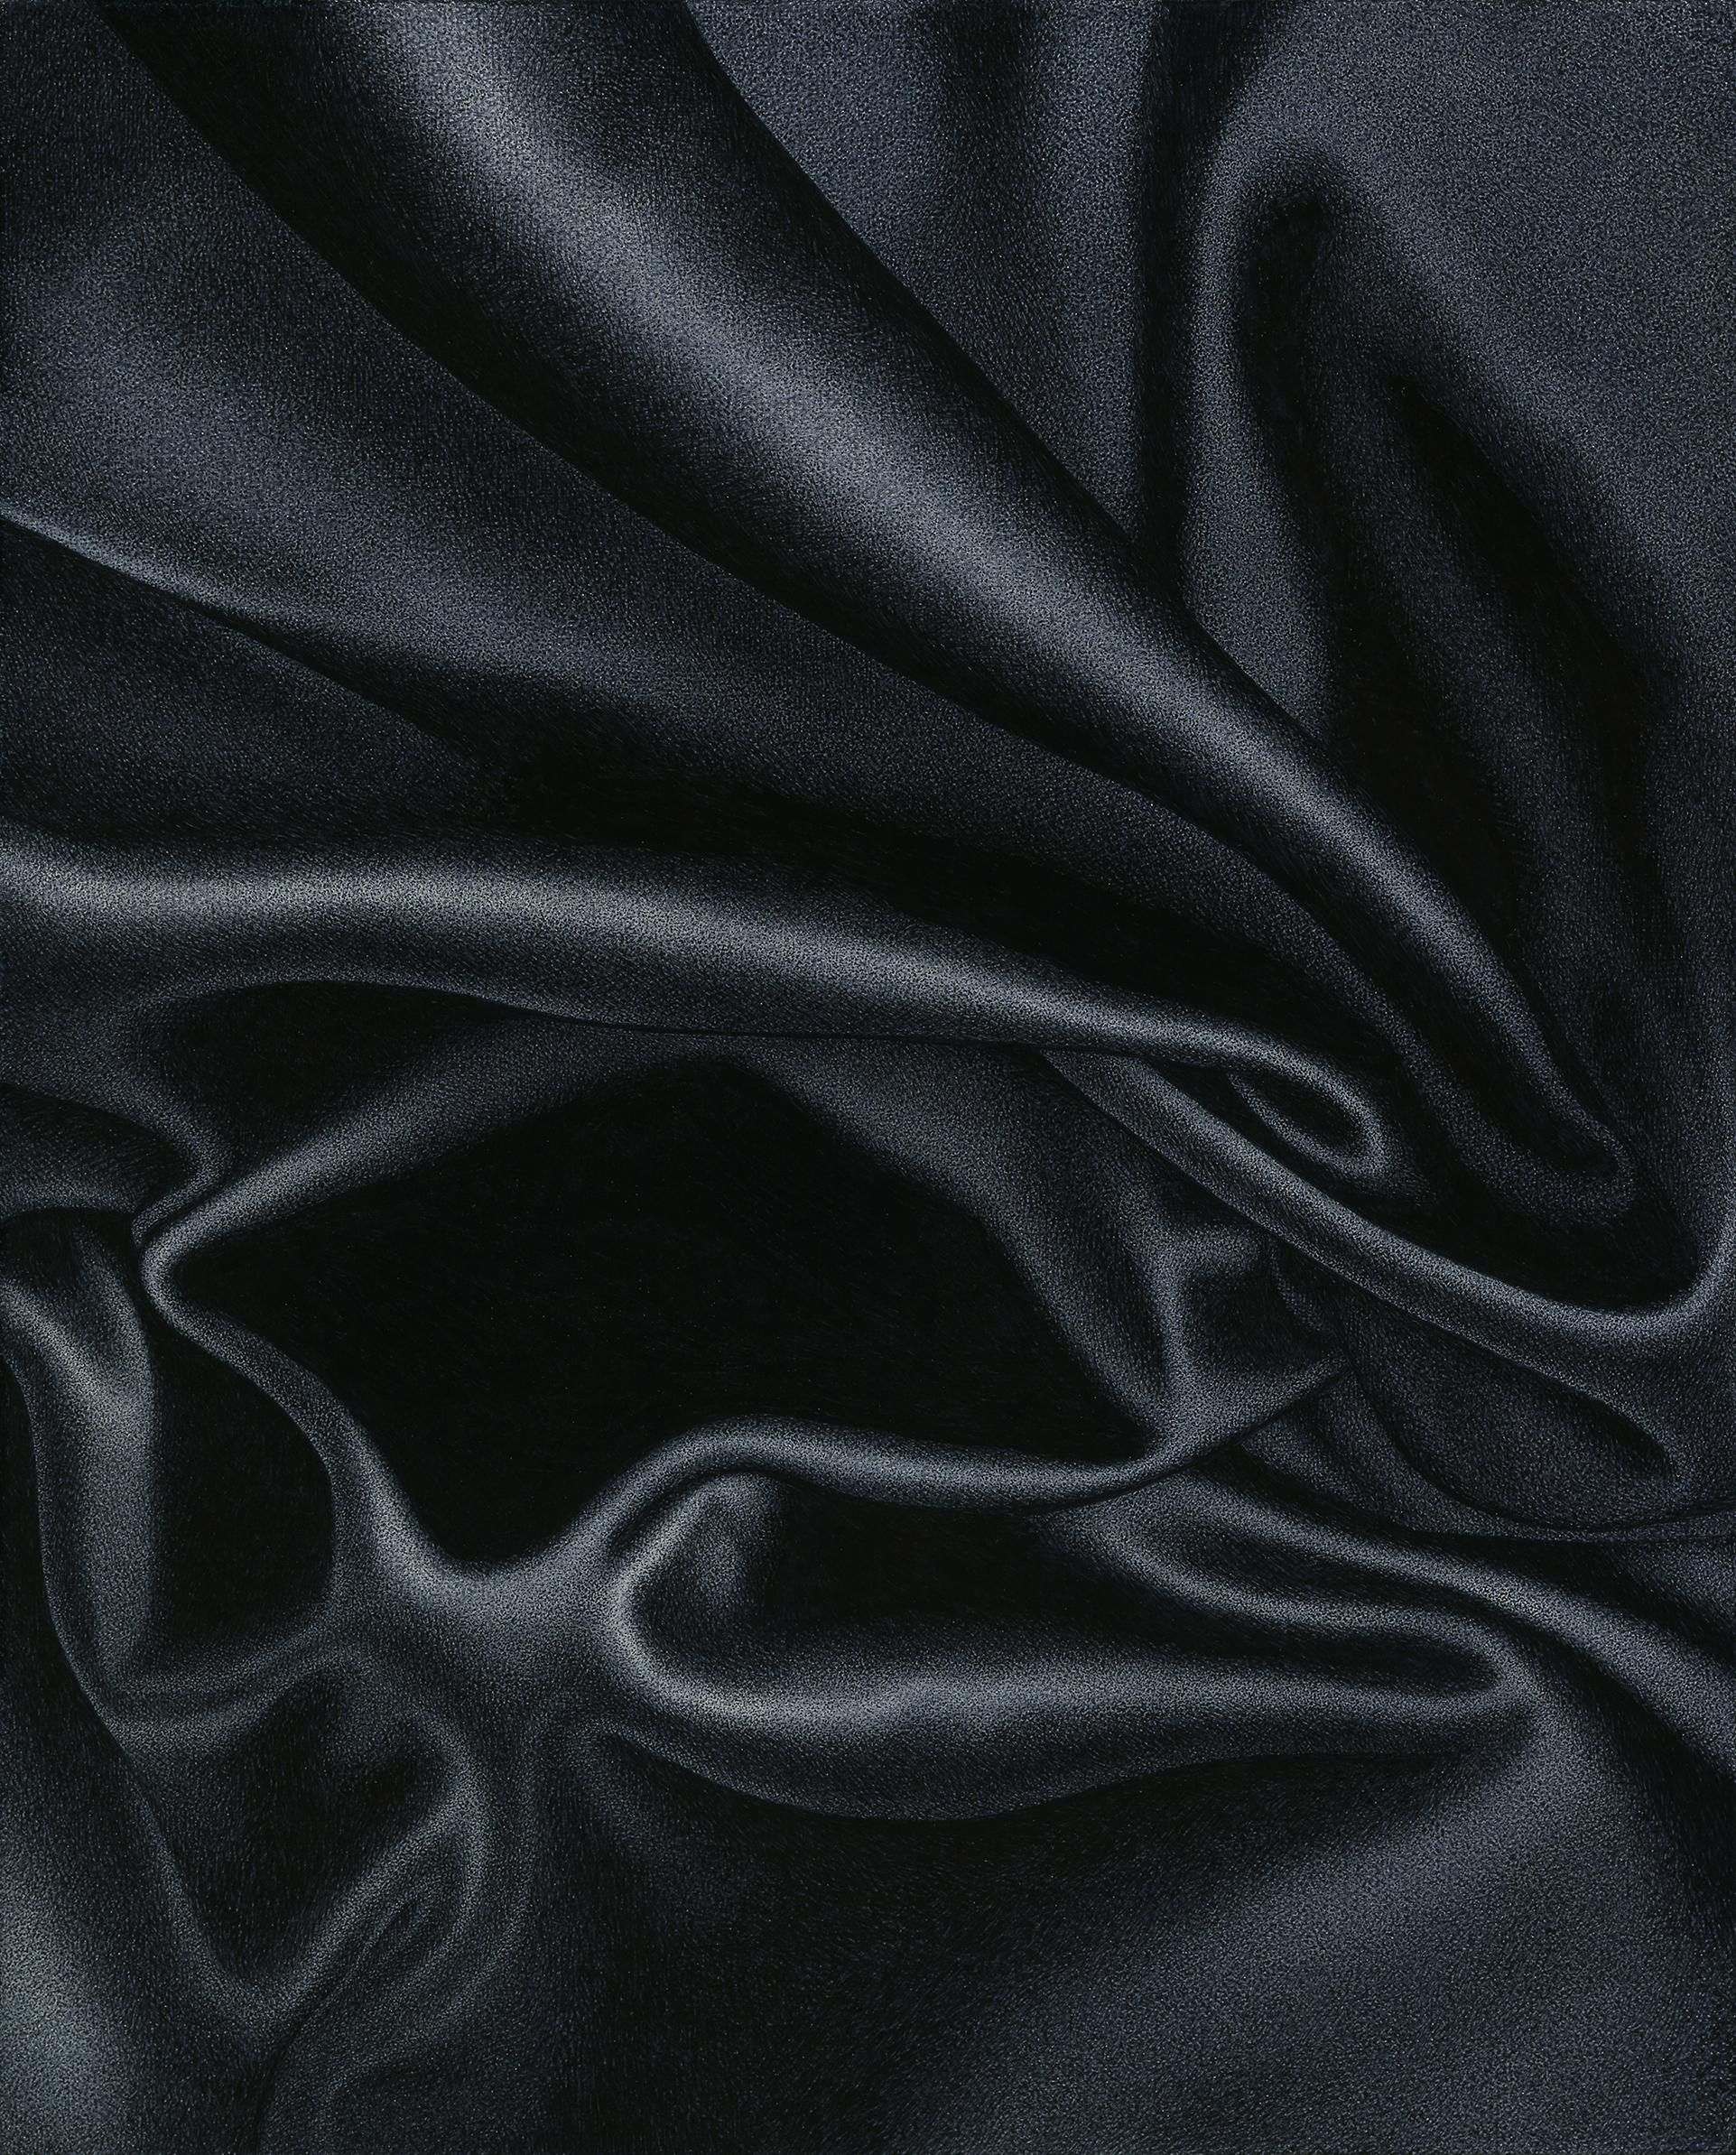 Black Silk, 2016